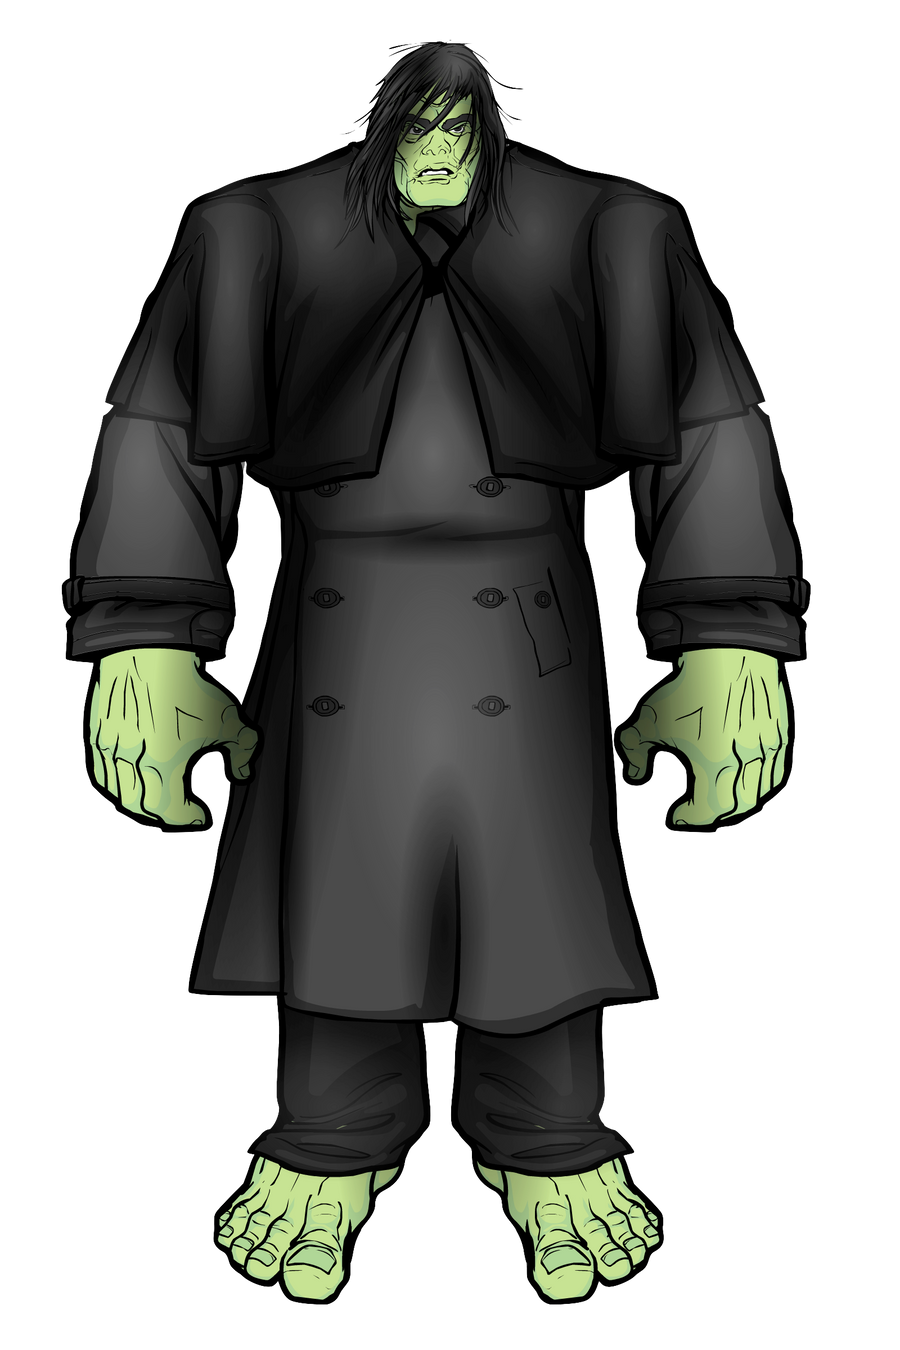 Frankensteins Monster By JR19759 On DeviantArt